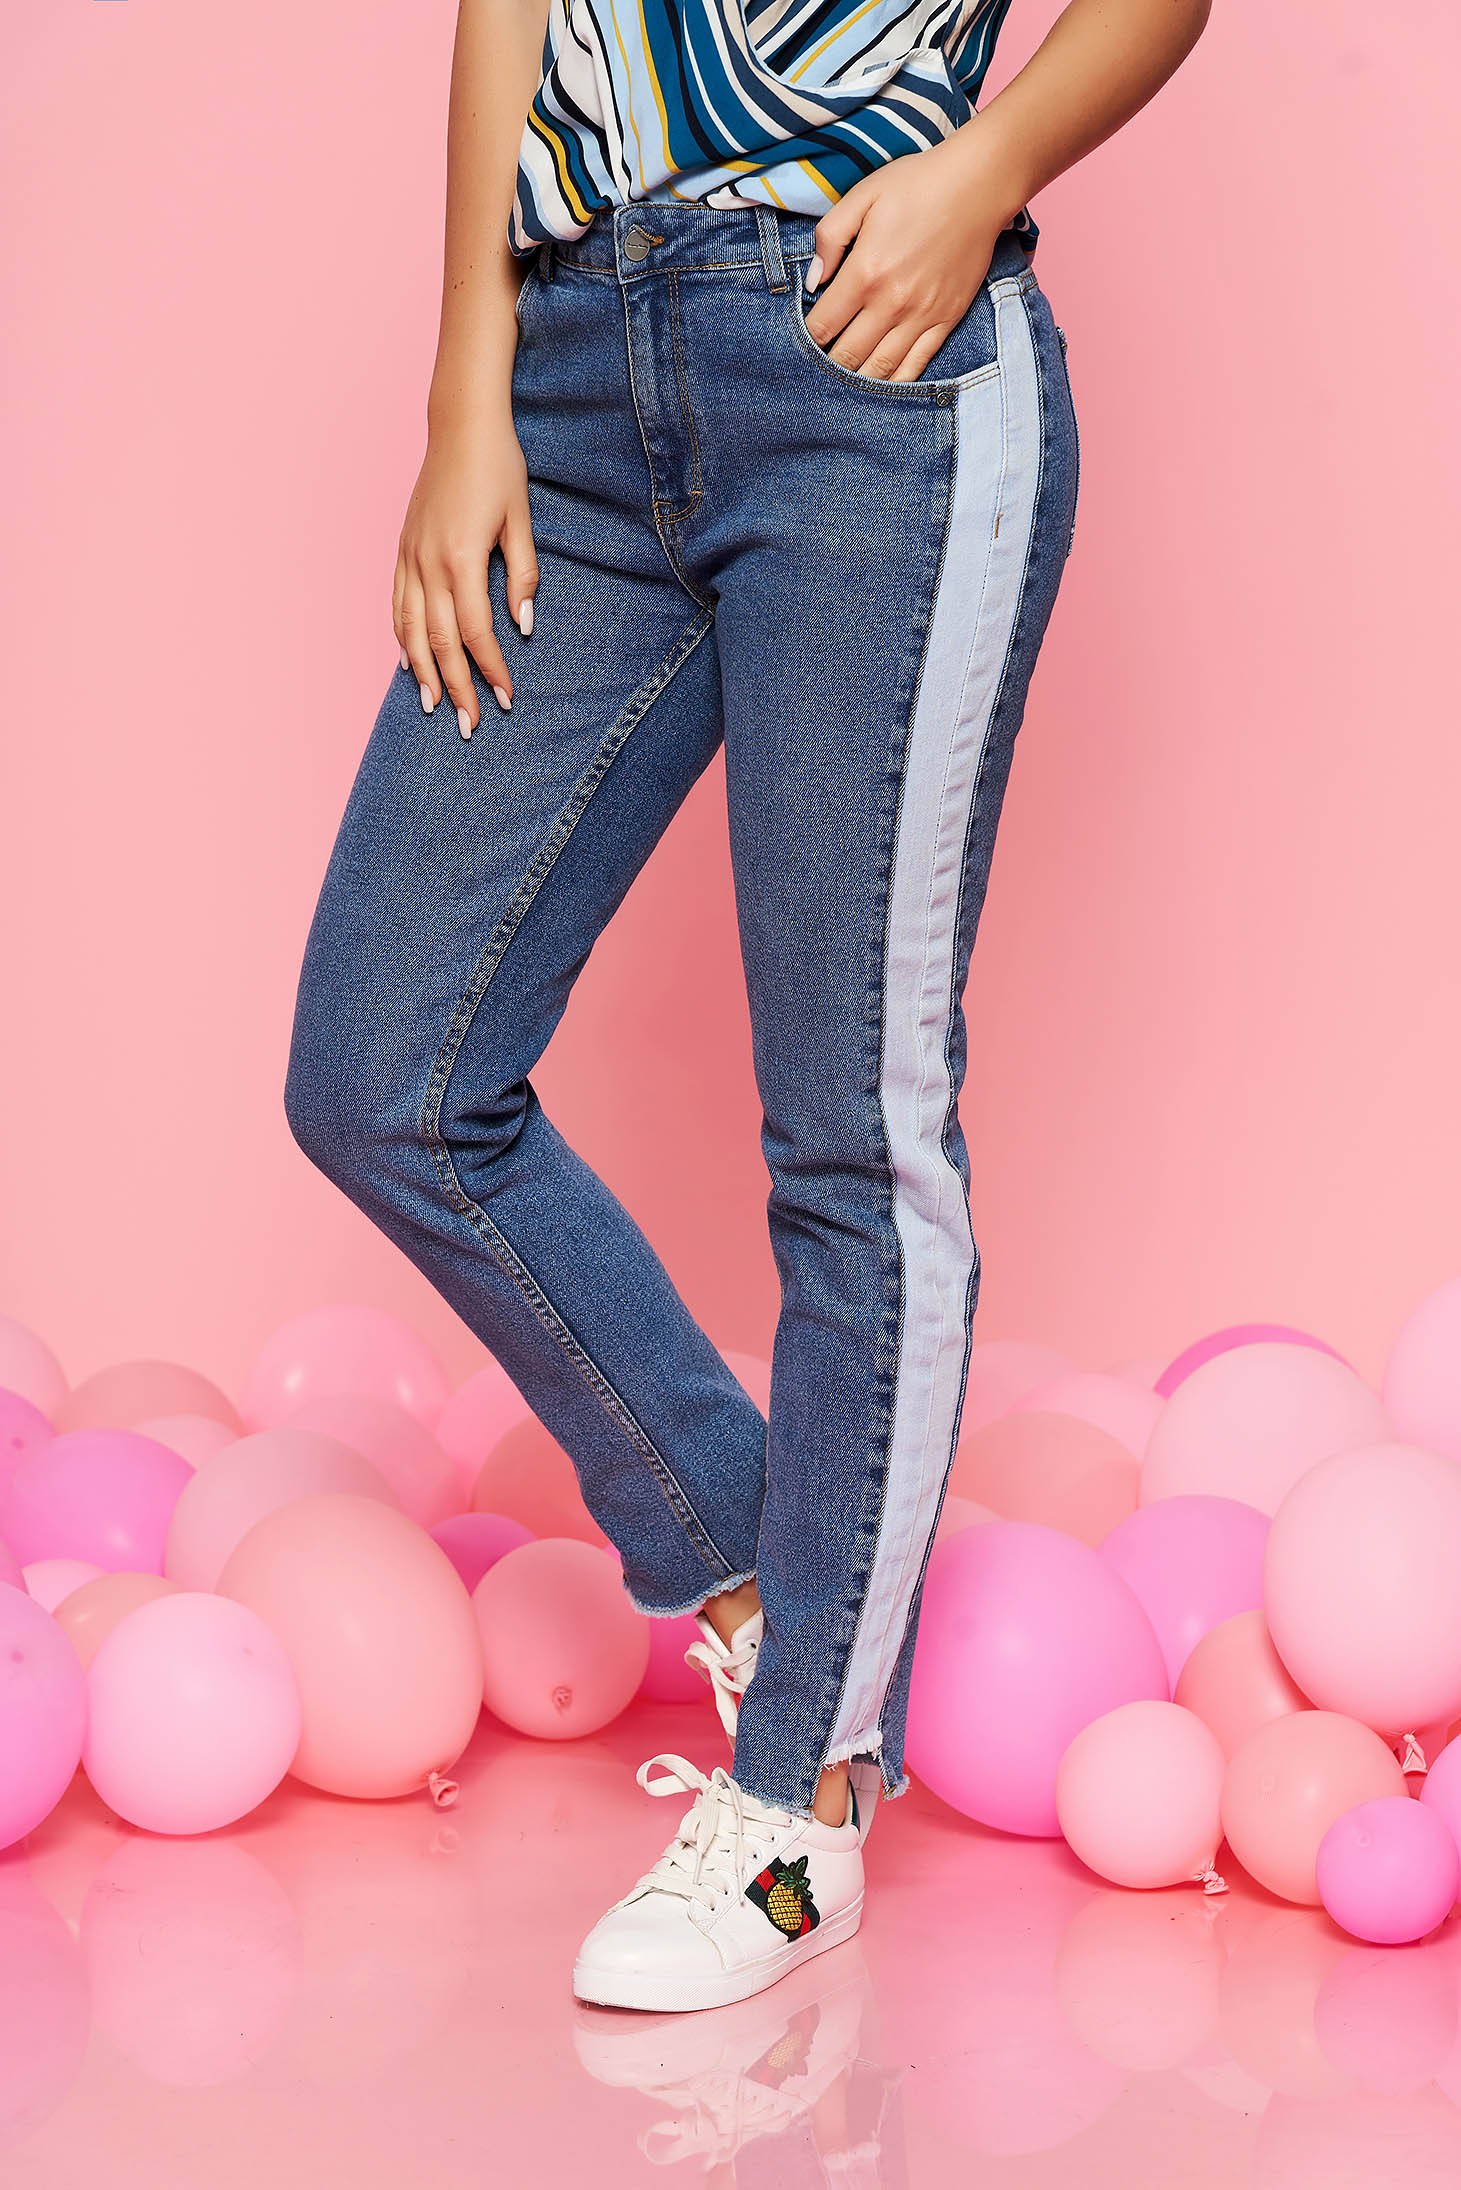 Top Secret blue trousers conical with medium waist denim